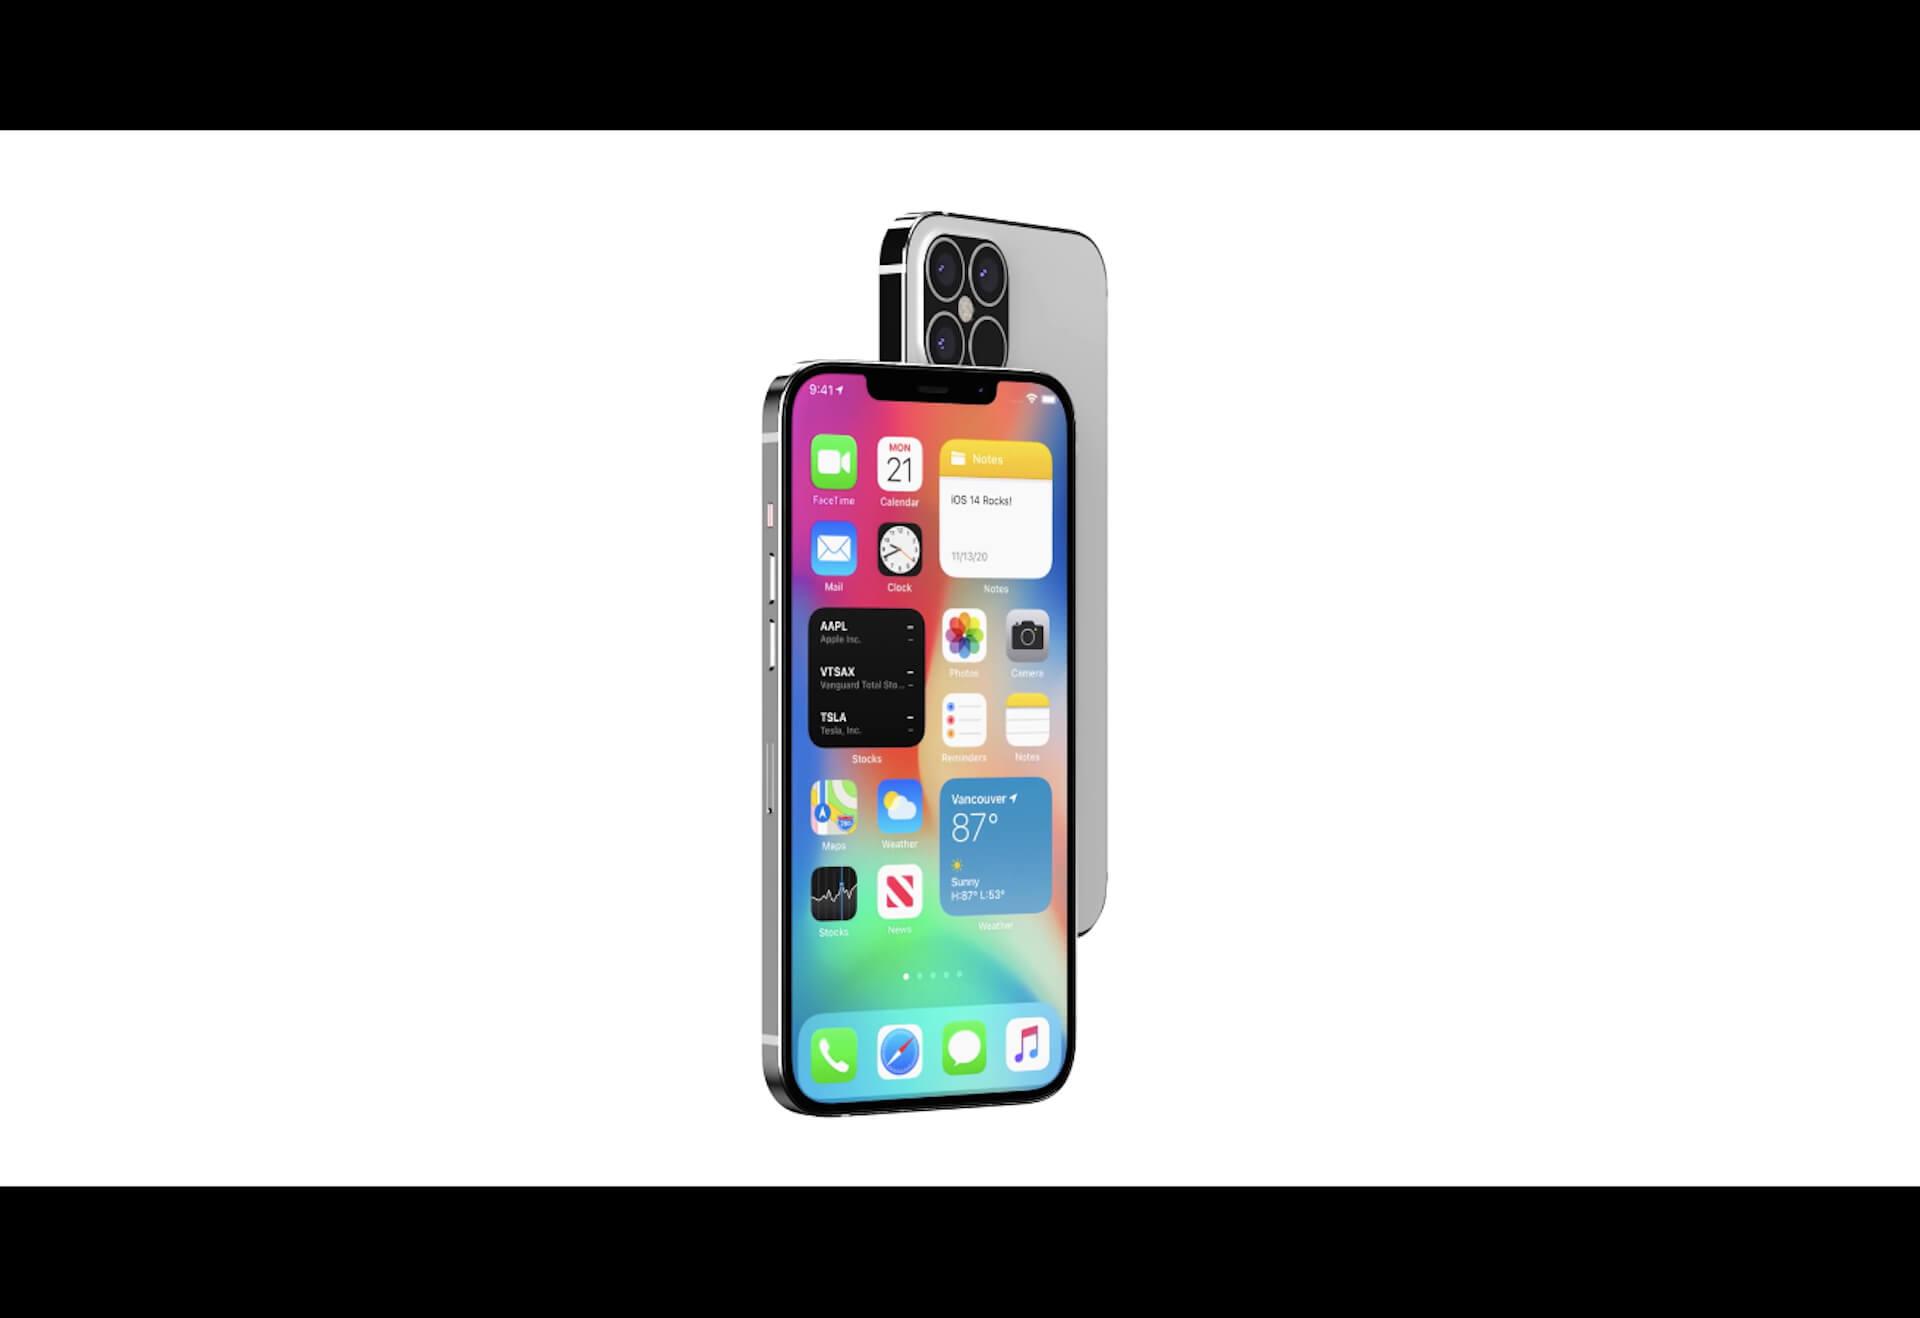 iPhone 12 Pro Maxのノッチ幅はあまり変わらず?LiDARスキャナ搭載は確定か|生産検証試験用モデルのリーク映像&画像が公開 tech200826_iphone12_notch_main